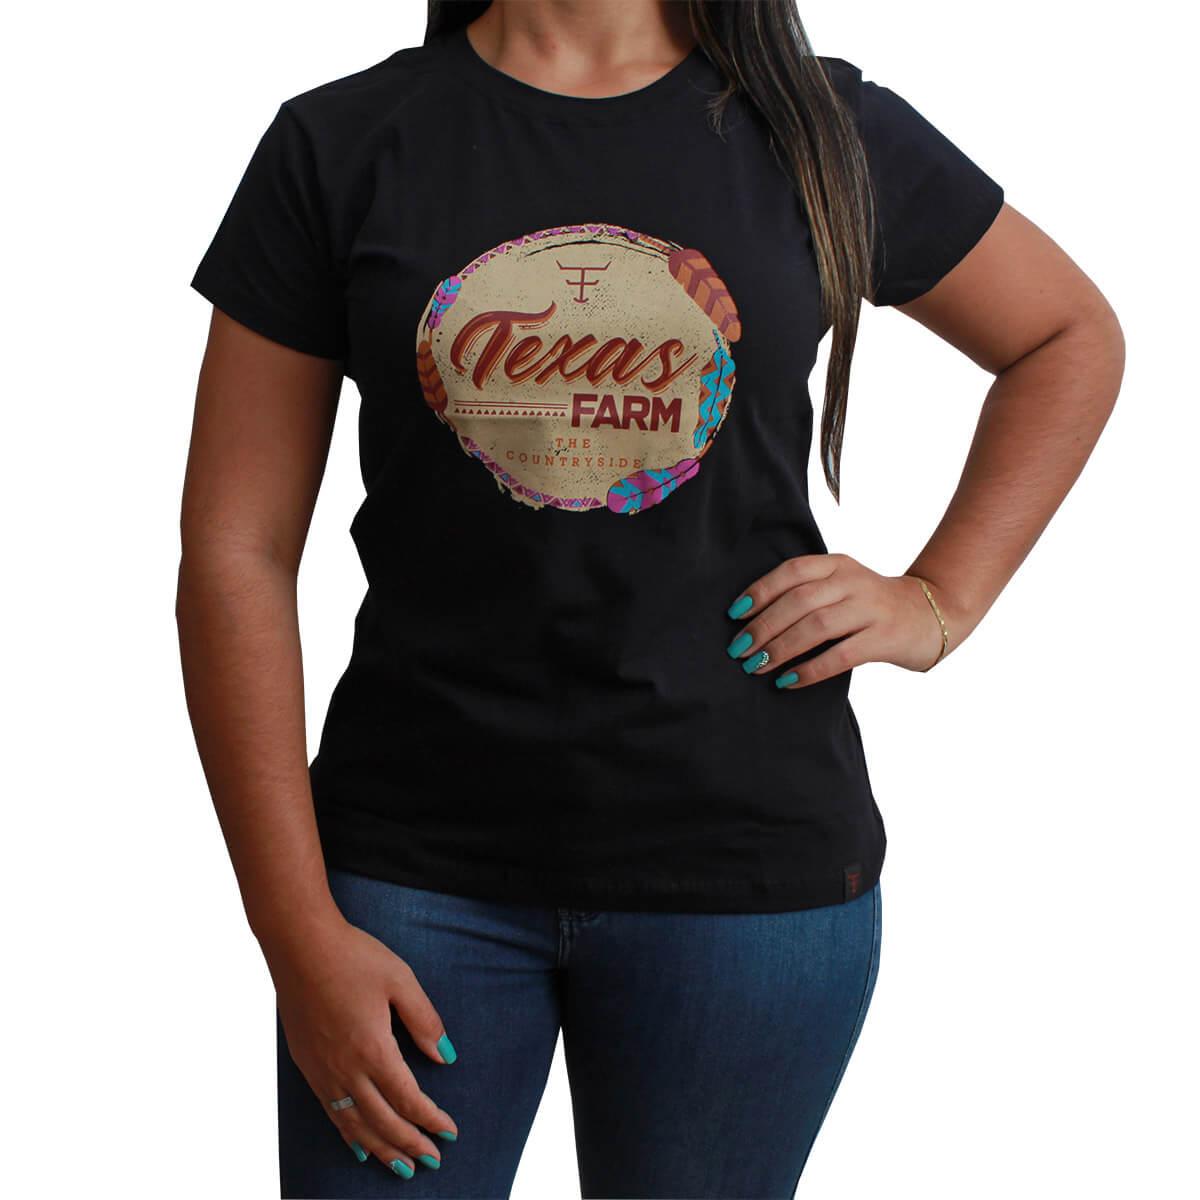 T-Shirt Texas Farm Preta Com Estampa De Pena